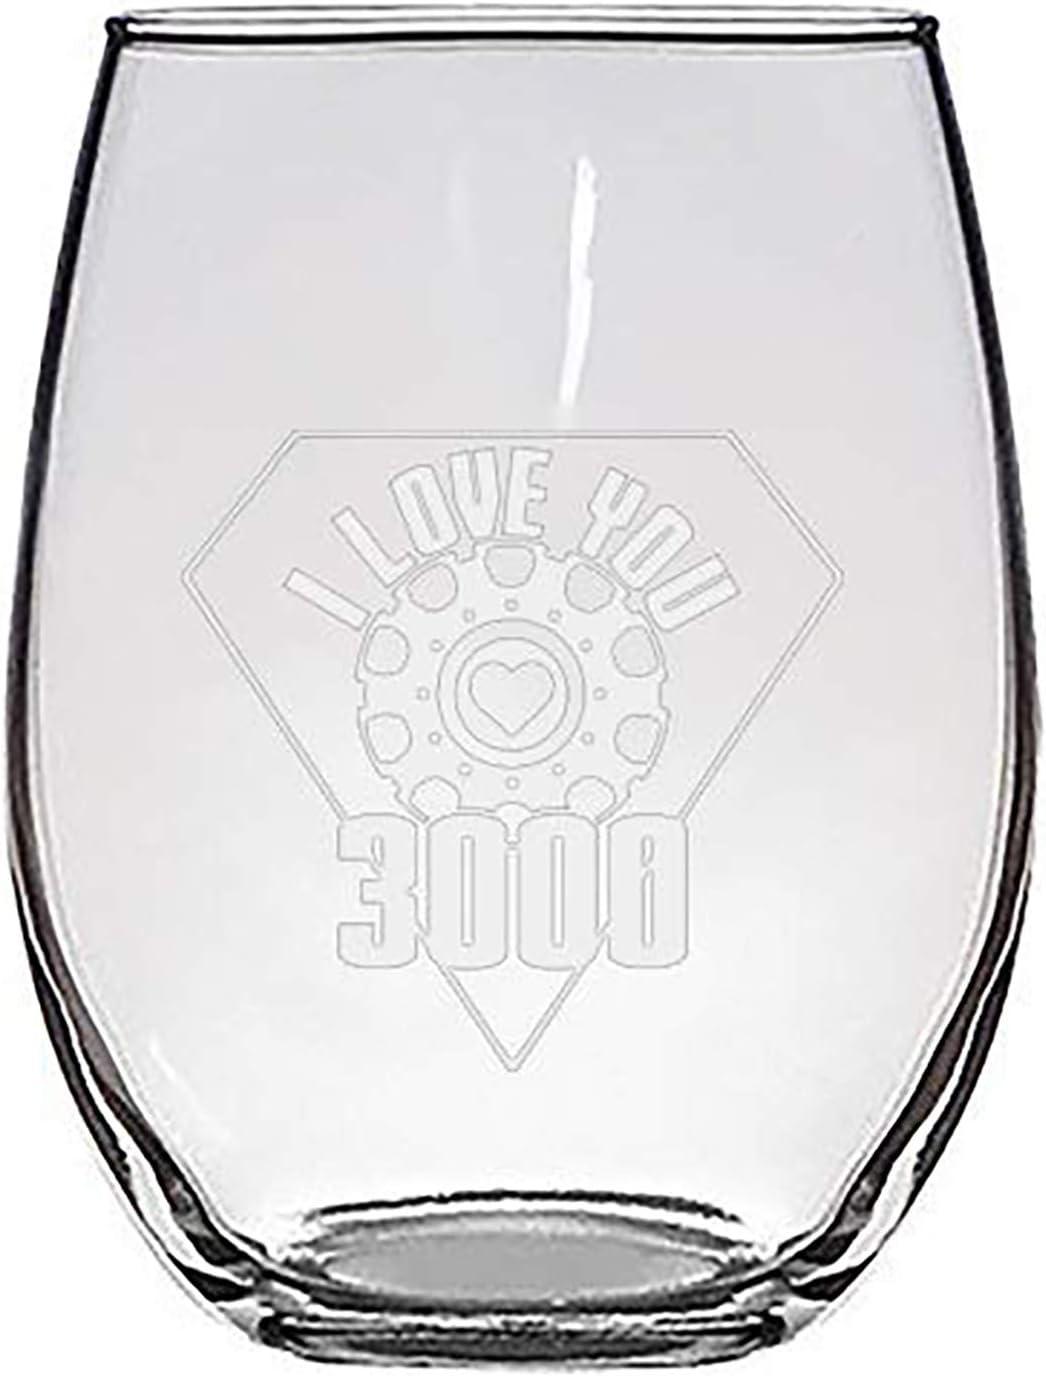 I San Diego Mall Love You 5 ☆ very popular 3000 Metal Heart - Engraved Parody Laser Reactor Film